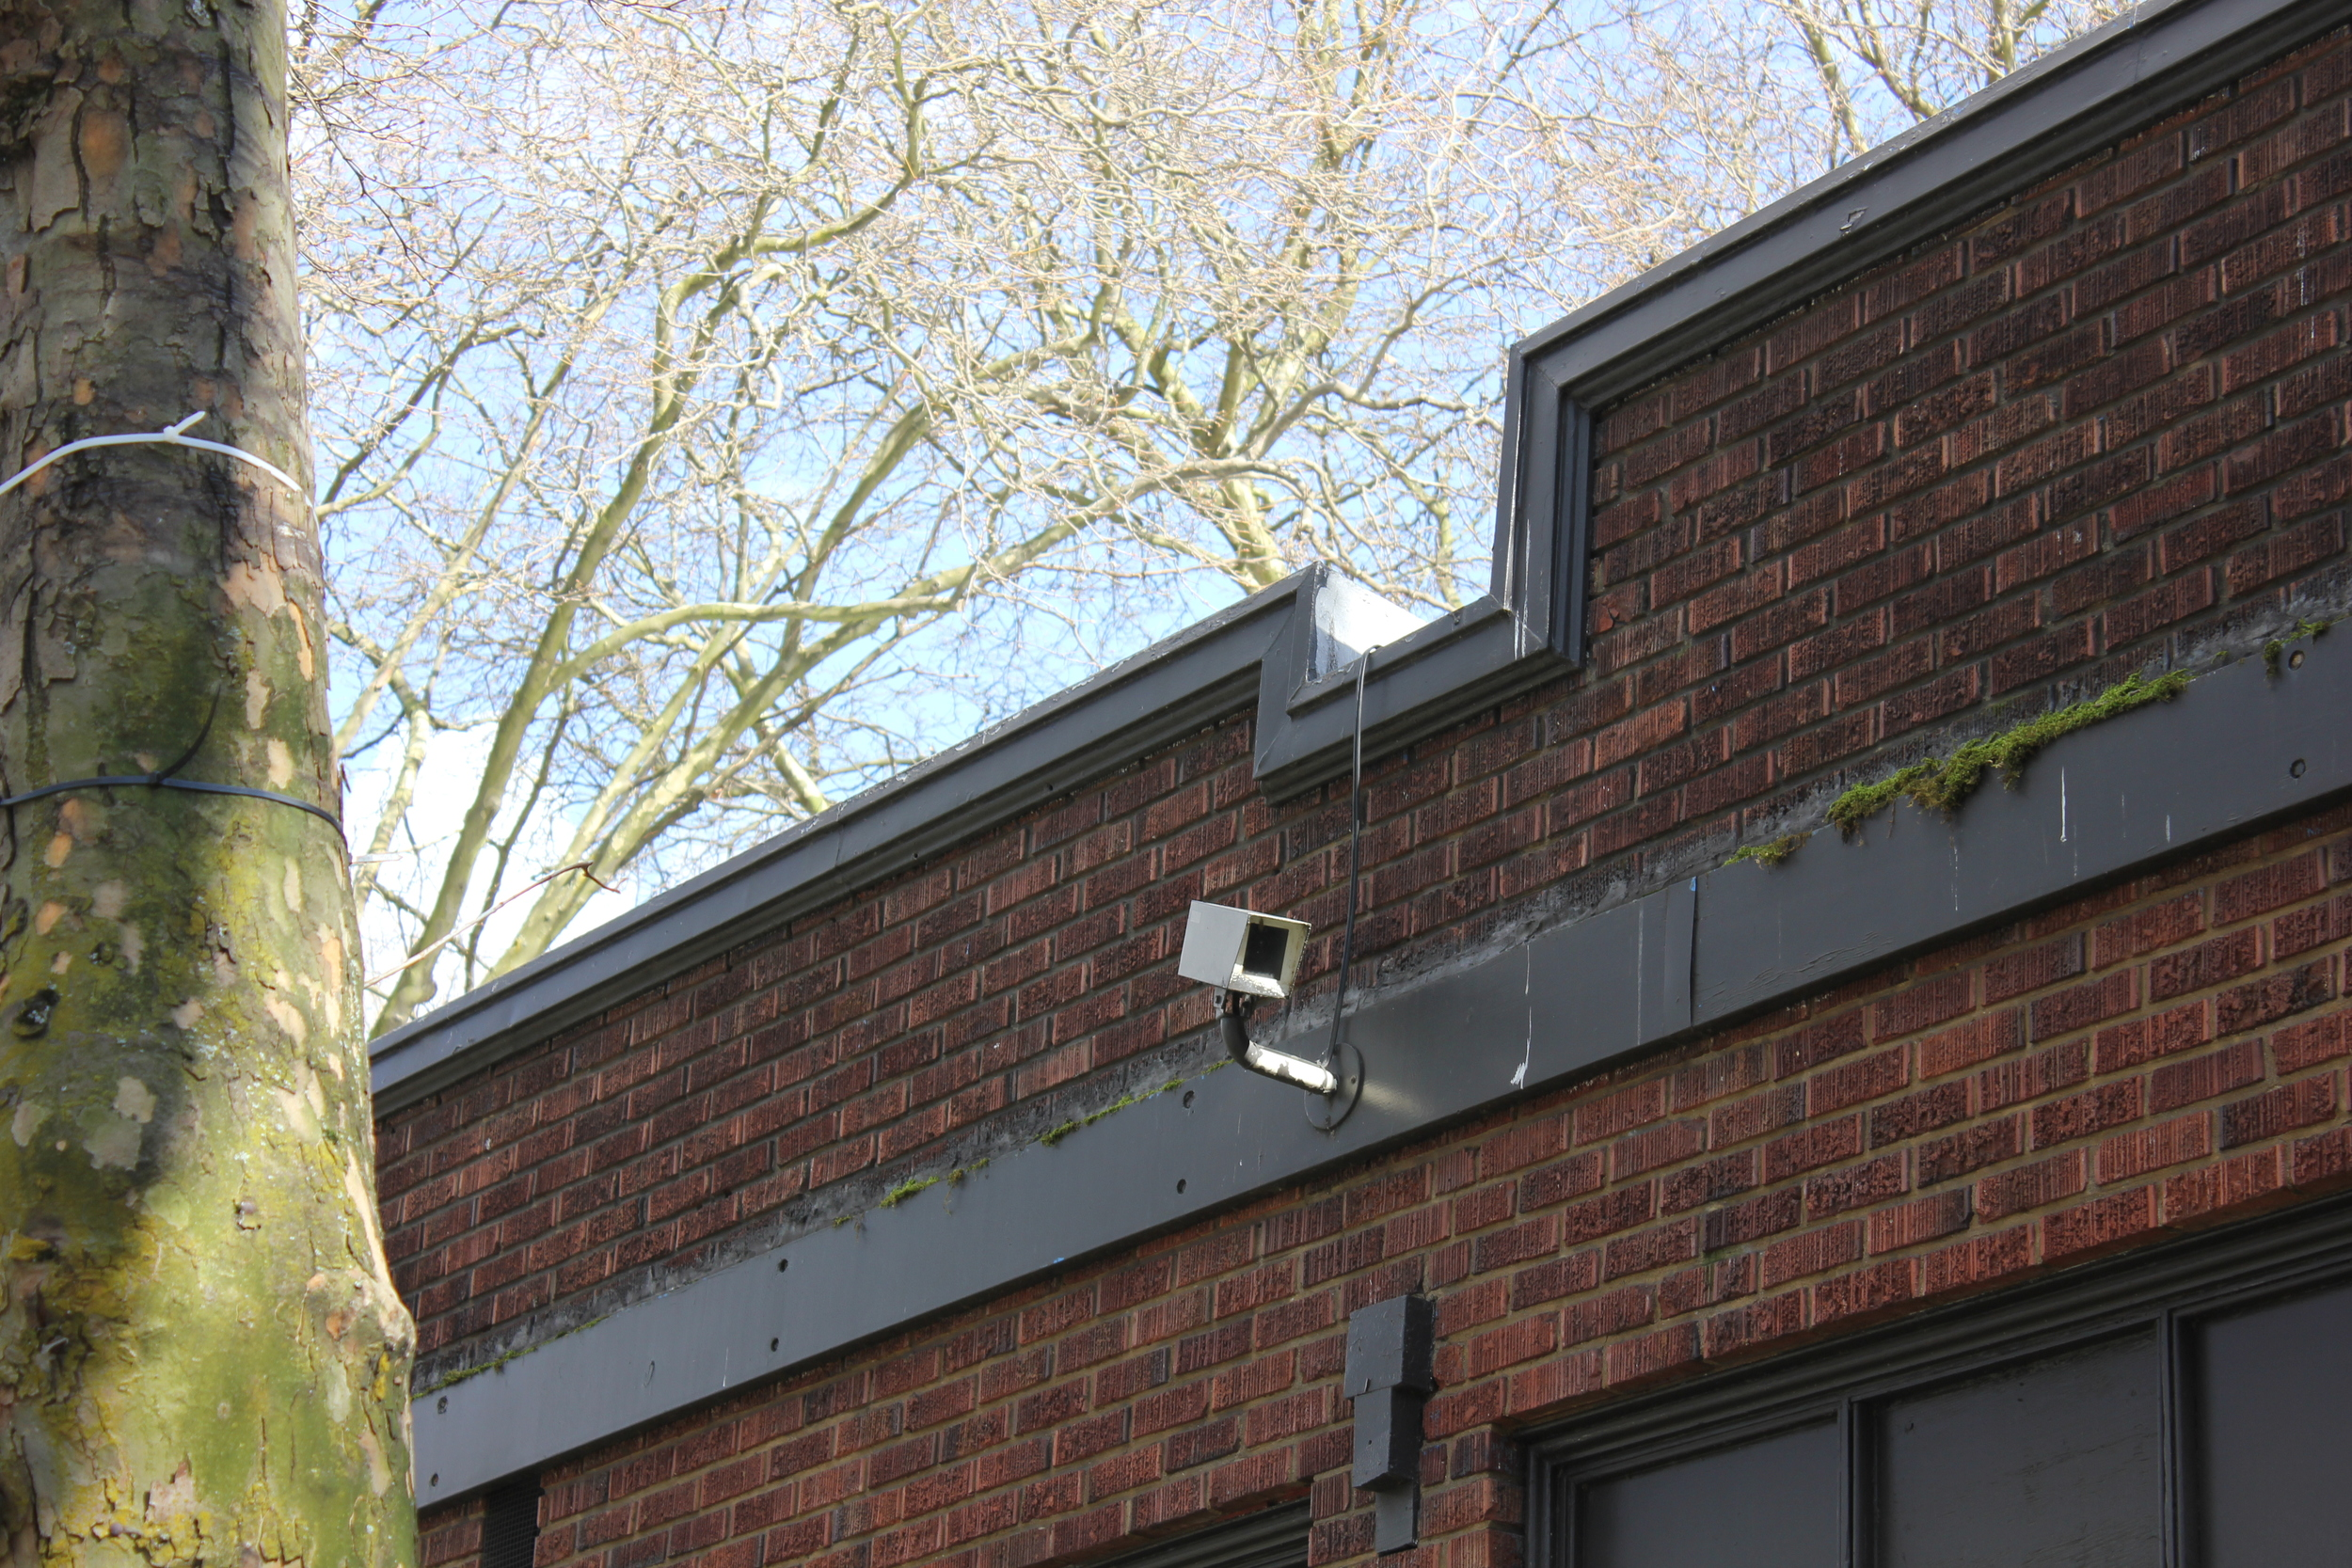 Security camera surveilling Tilikum Place.